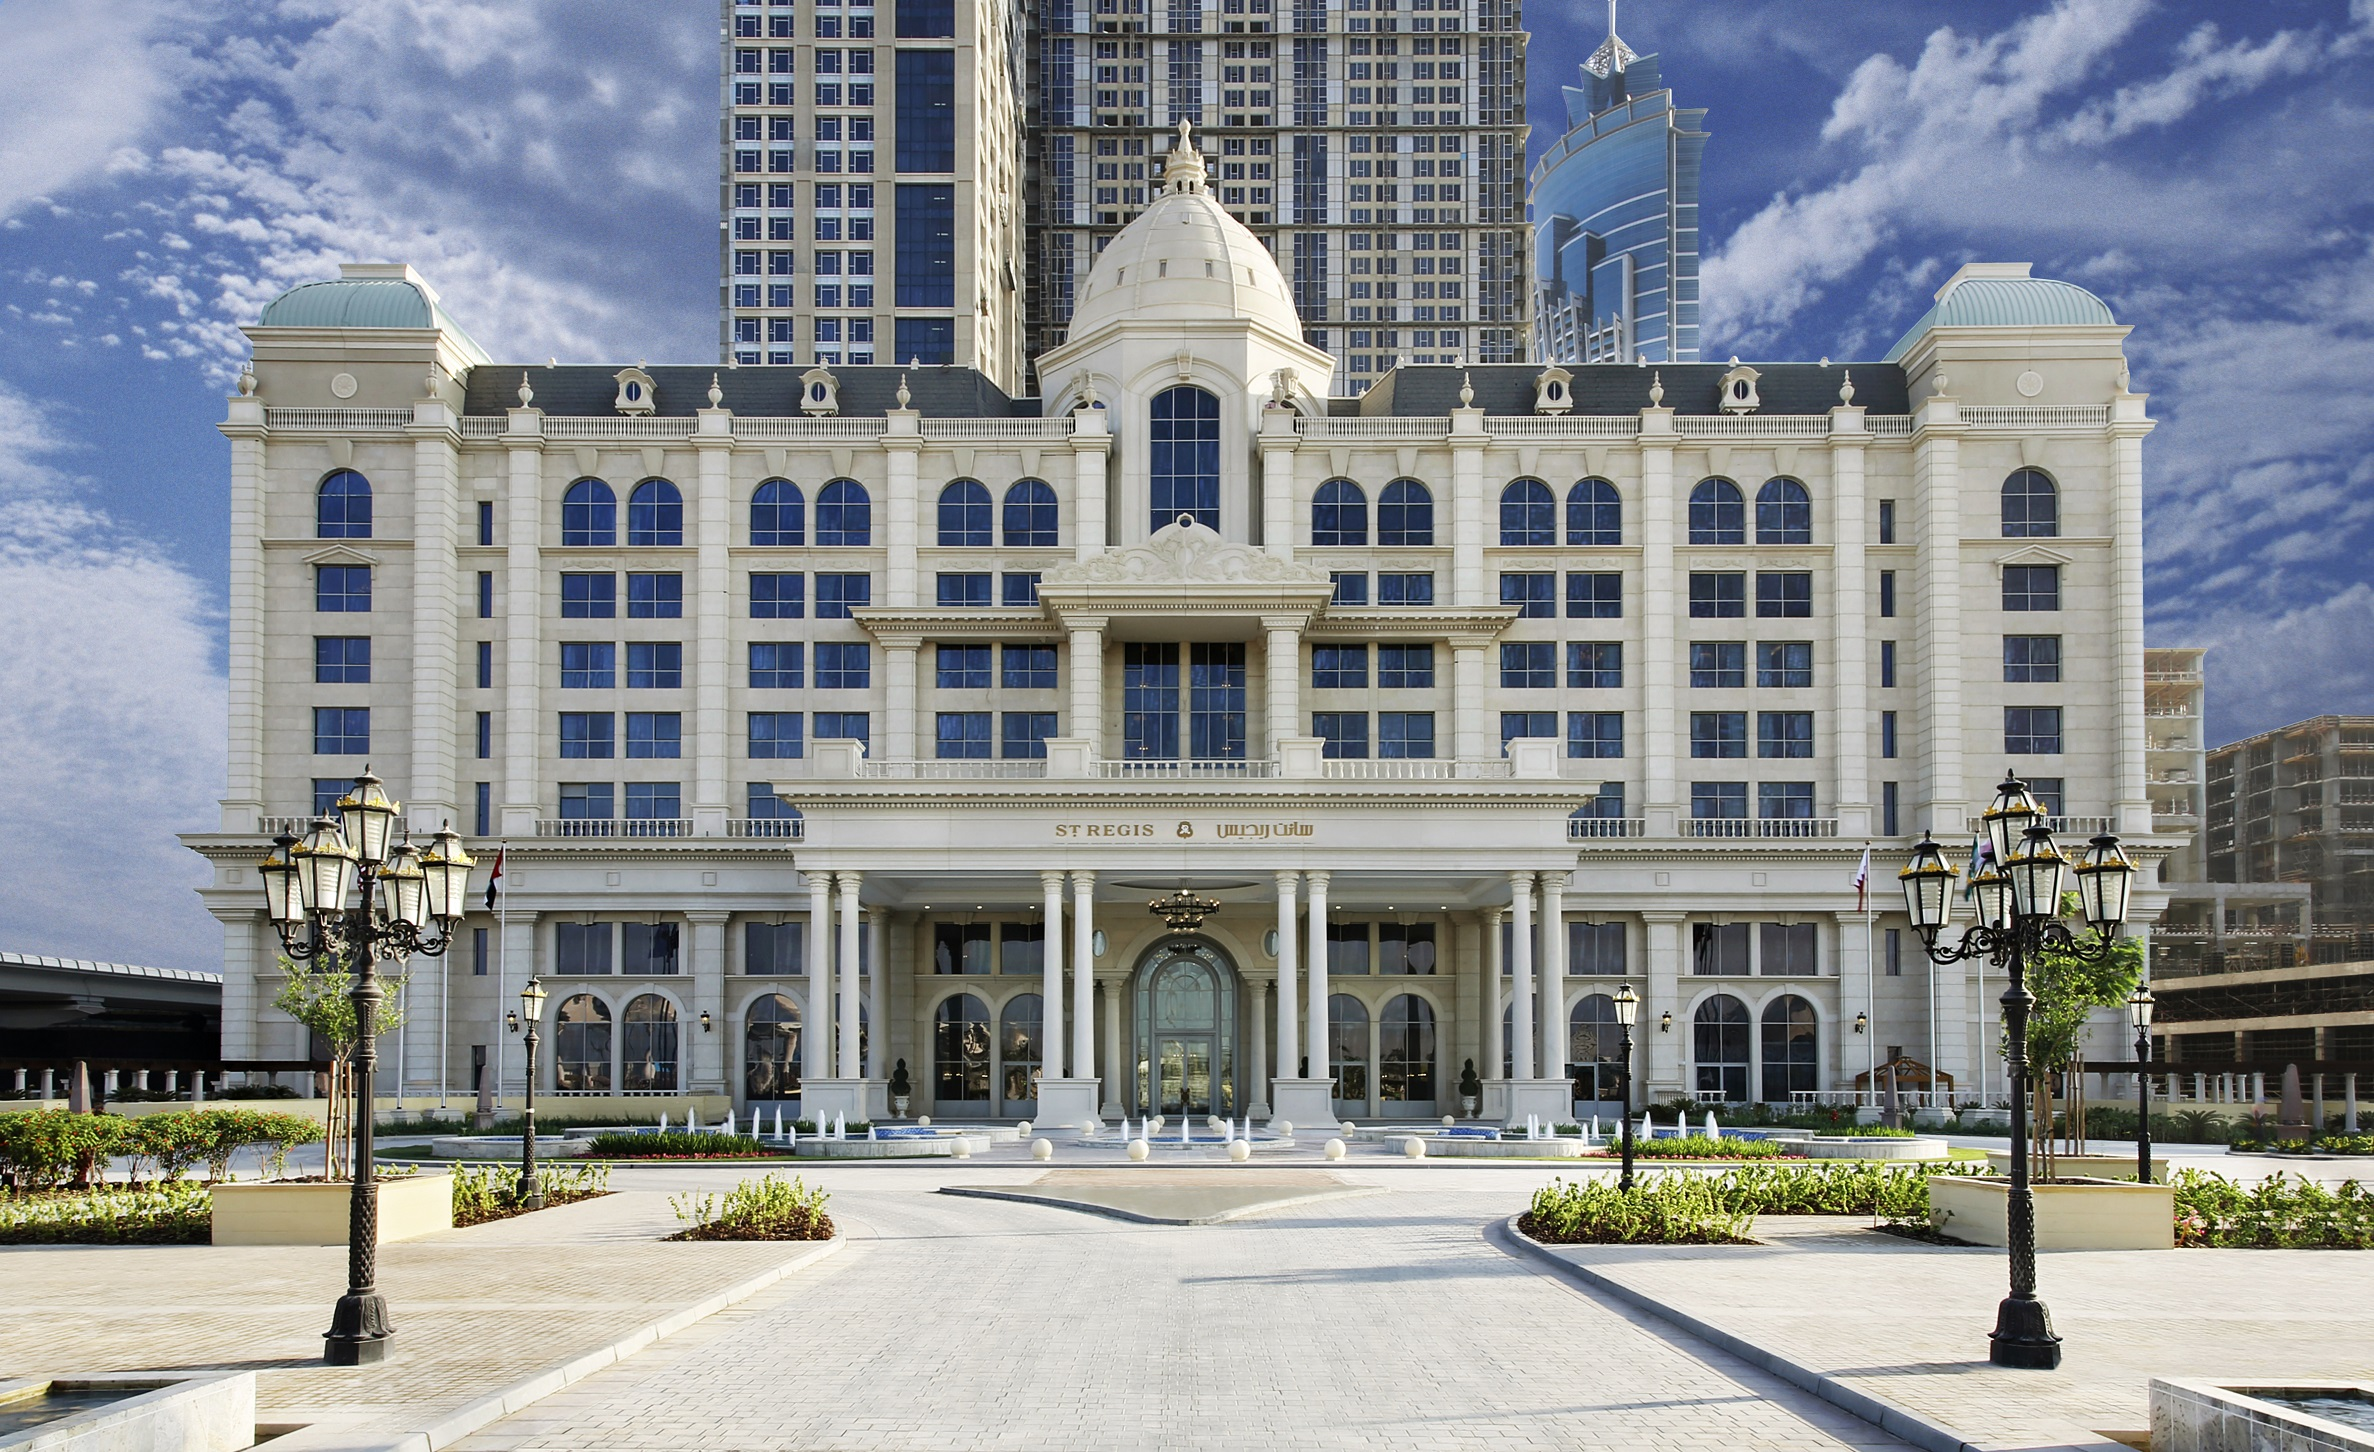 The St. Regis Dubai Exterior - Day shot